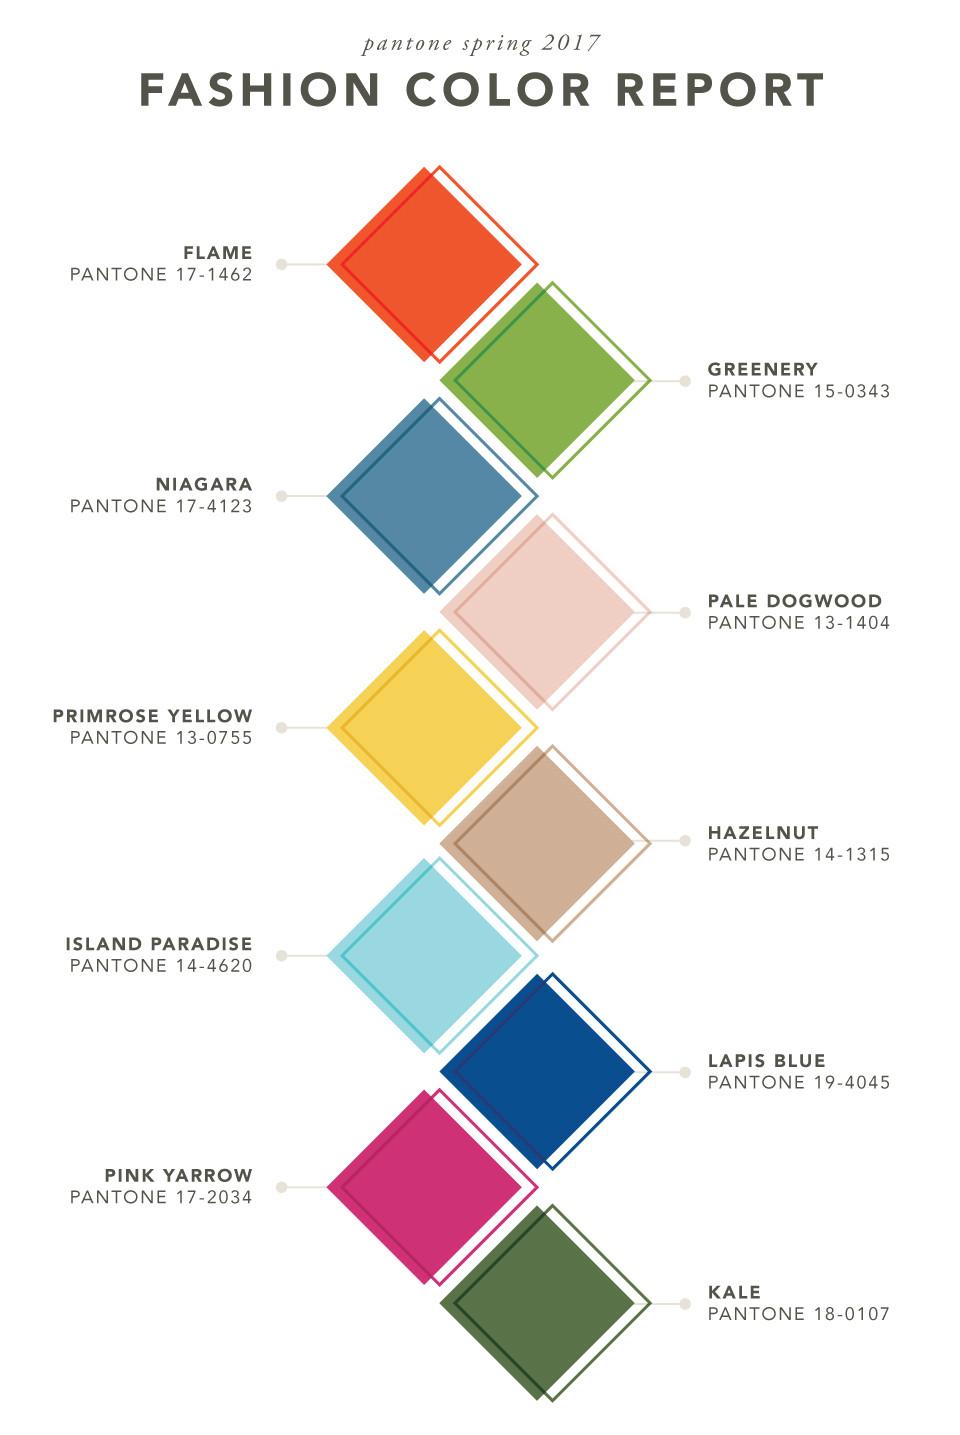 Pantone Spring 2017 Fashion Color Report Colors